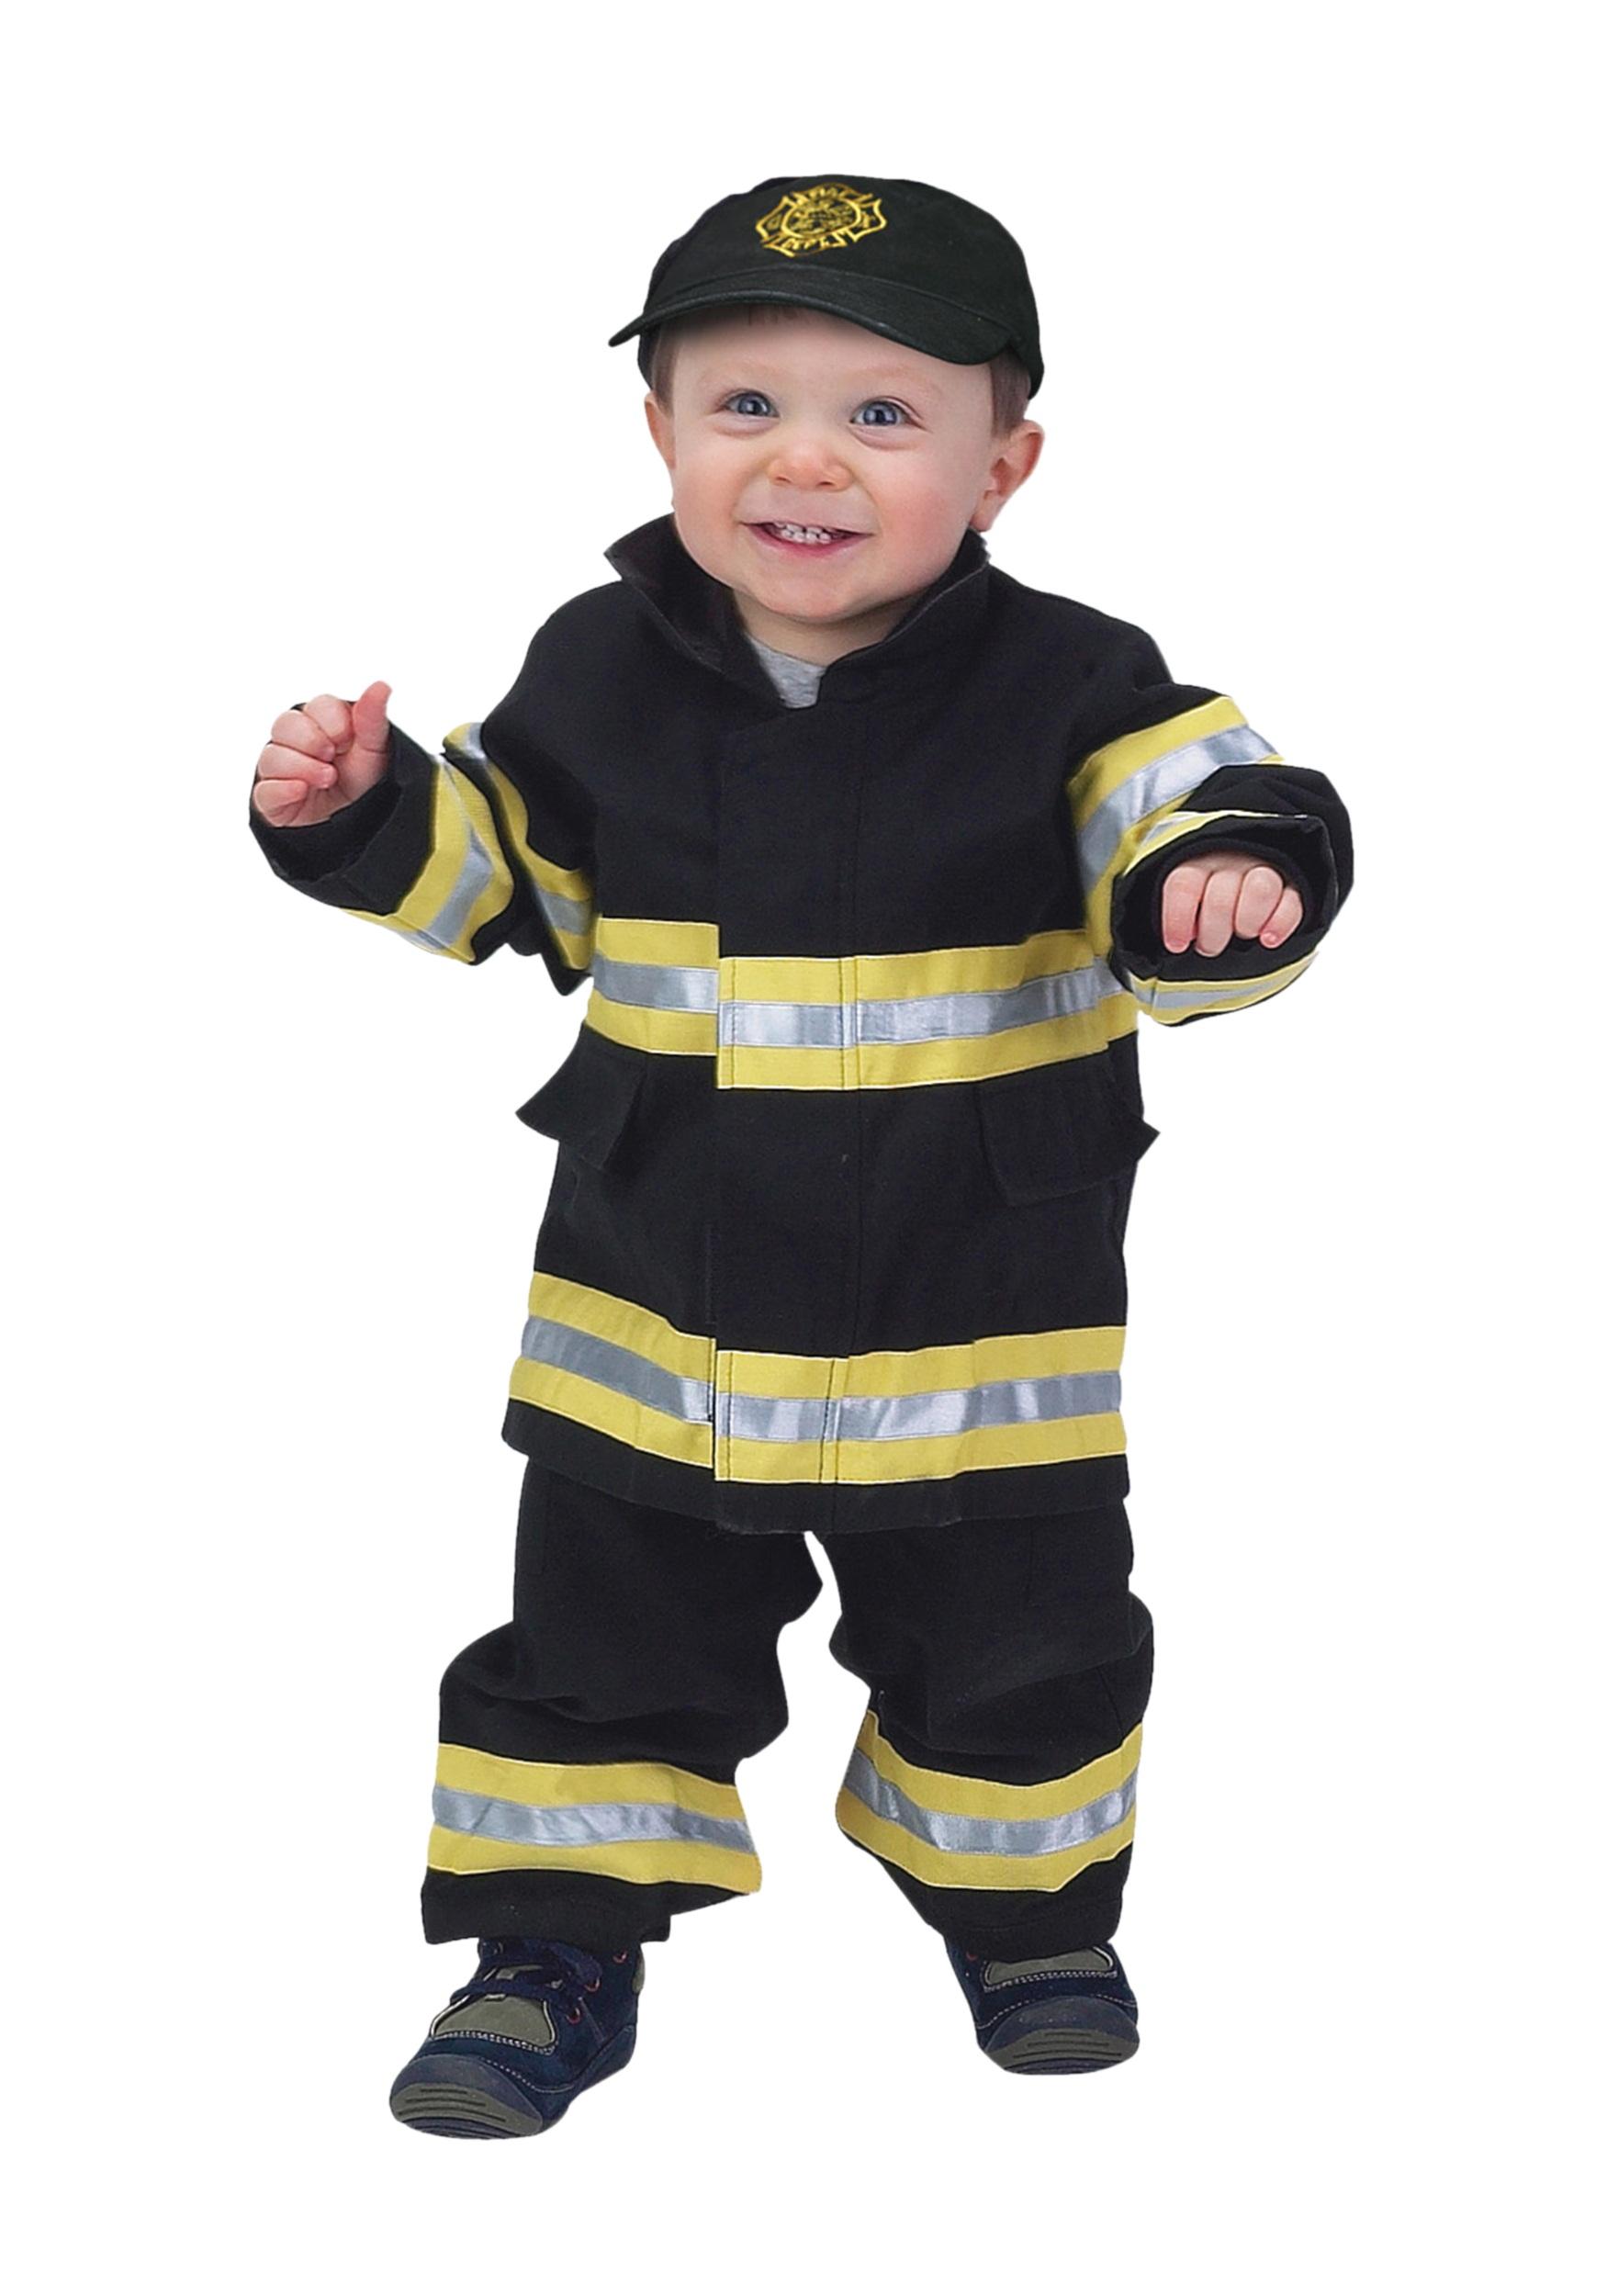 Firefighter Home Decorations Toddler Black Firefighter Costume